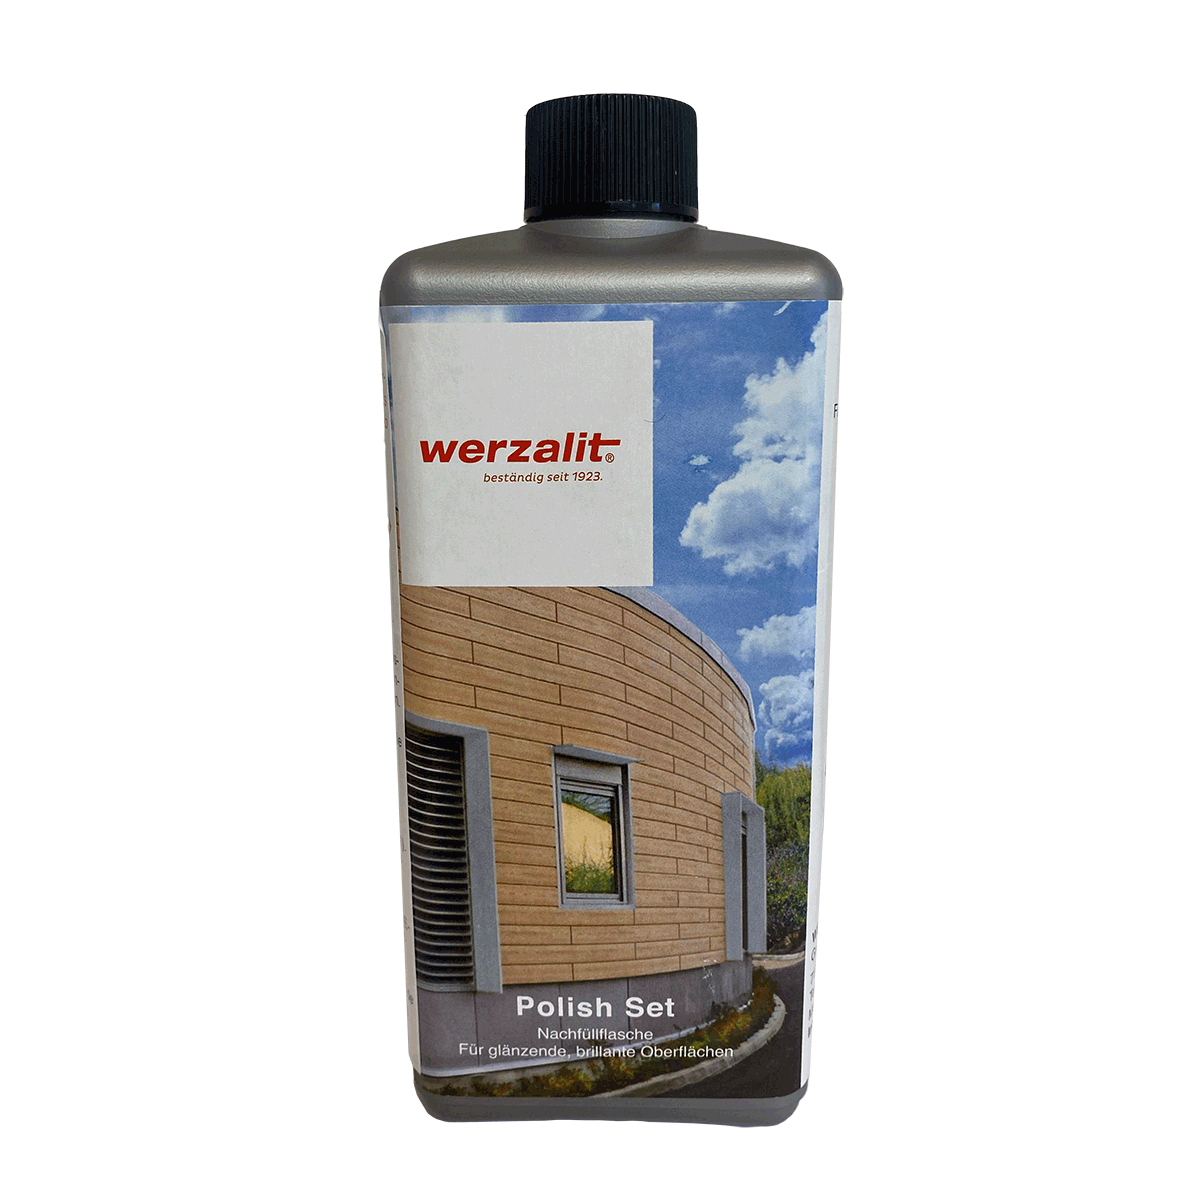 24 019 000 Polish Nachfuellflasche e1631187119563 - https://www.werzalit.com/en/product/polish-set-nachfuellflasche/